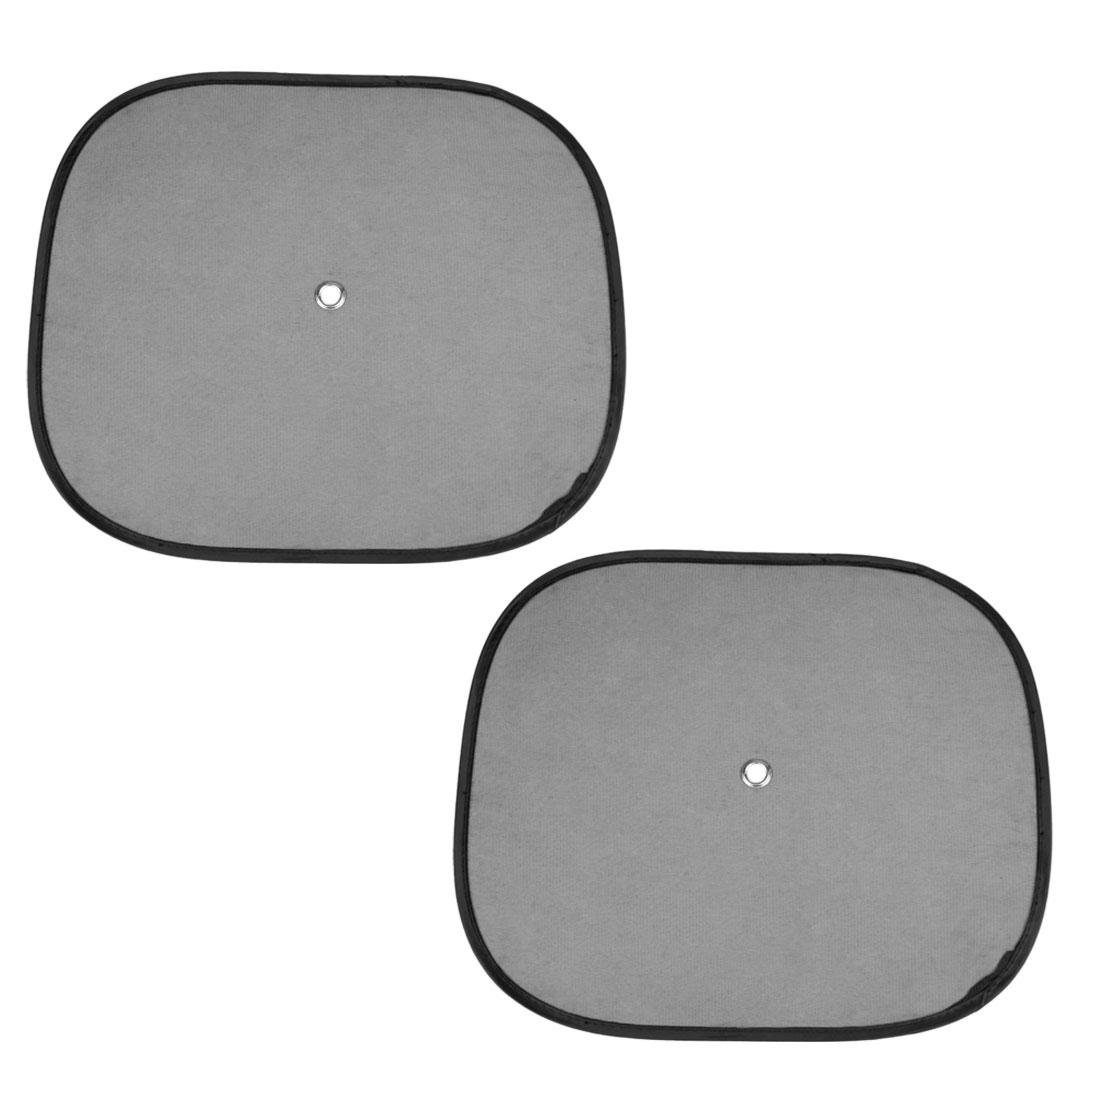 Foldable Portable Car Side Window Mesh Sunshade Black 2 Pcs